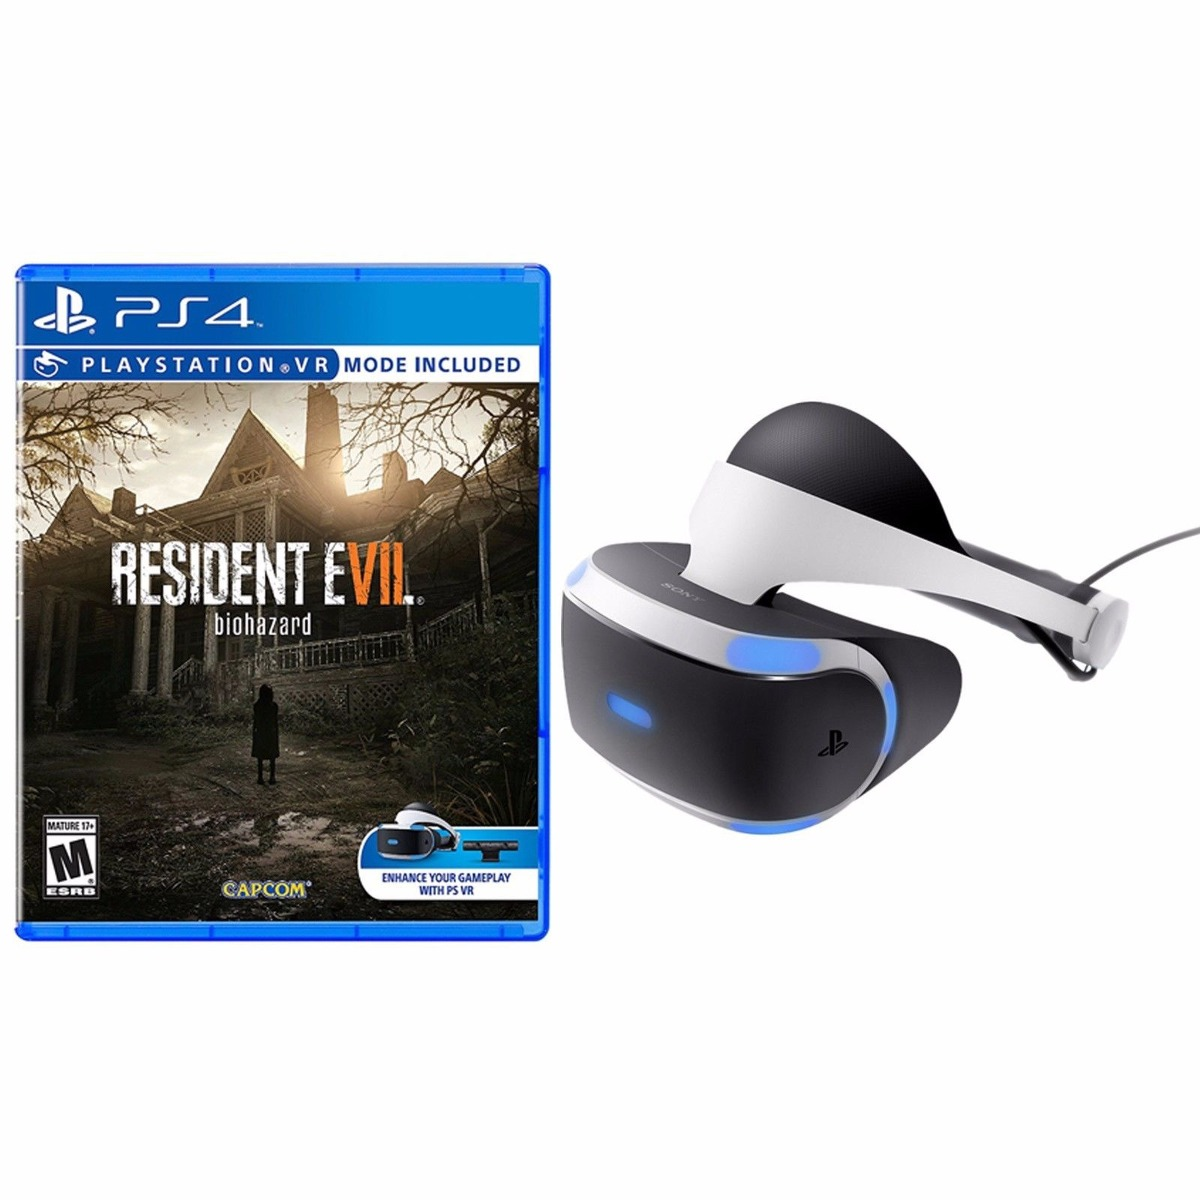 Casco Vr Realidad Virtual Play Station 4 Resident Evil